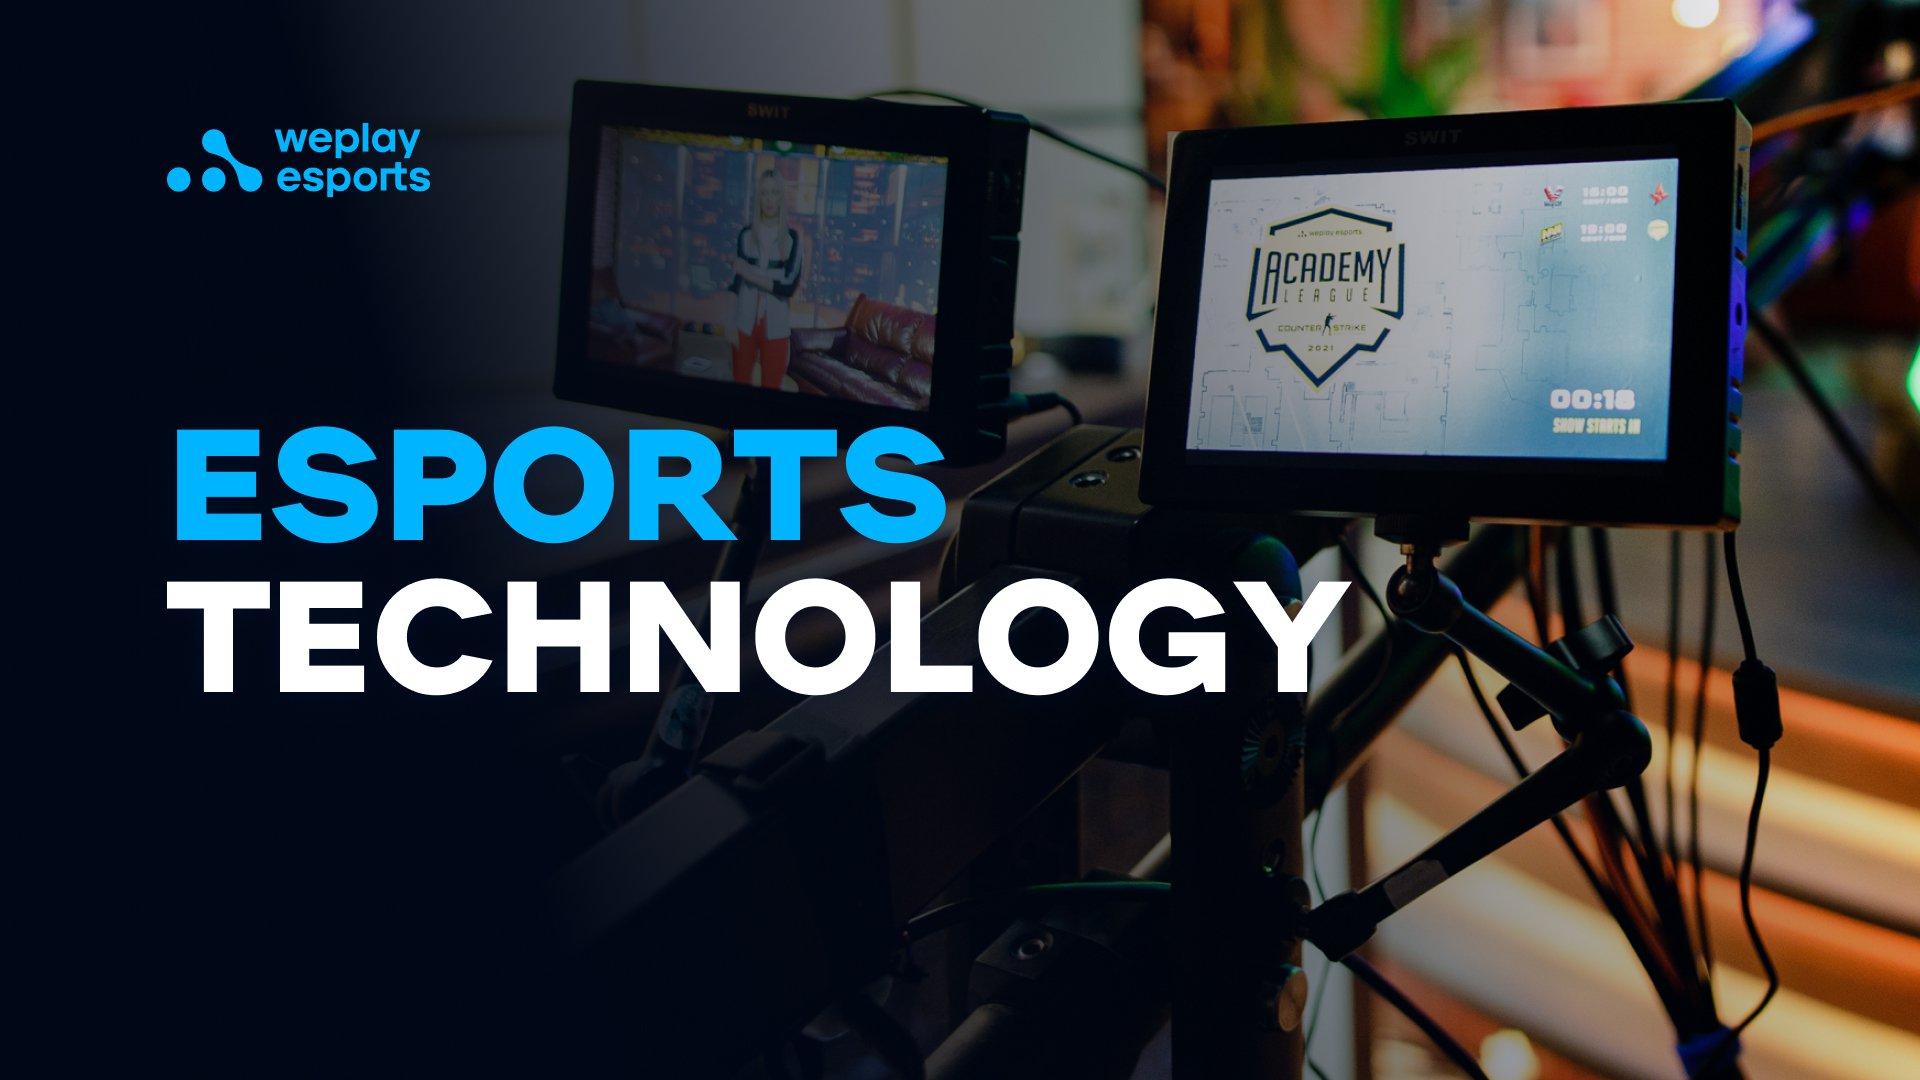 Esports Technology